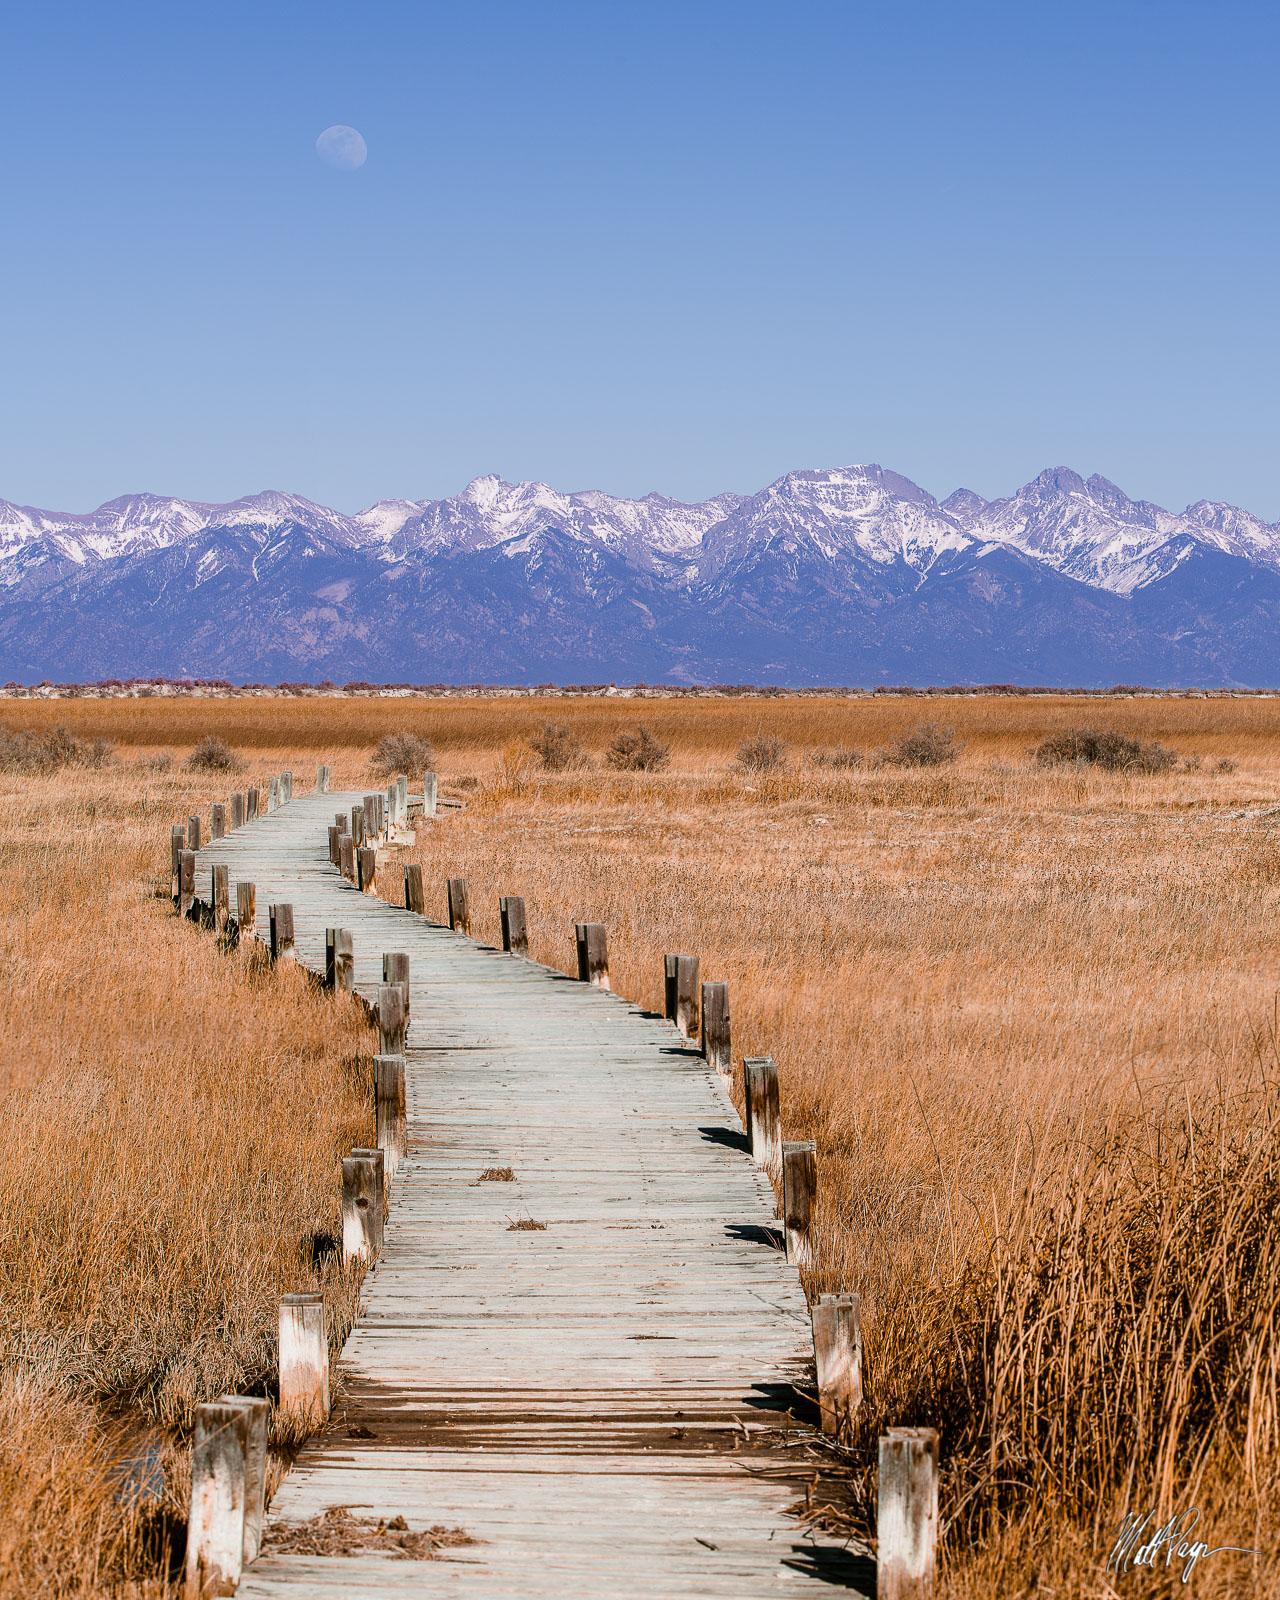 13ers, 14ers, Colorado, Crestone Needle, Crestone Peak, Kit Carson Mountain, Landscape, Mount Adams, Mountains, San Luis Valley, Sangre de Cristo, photo